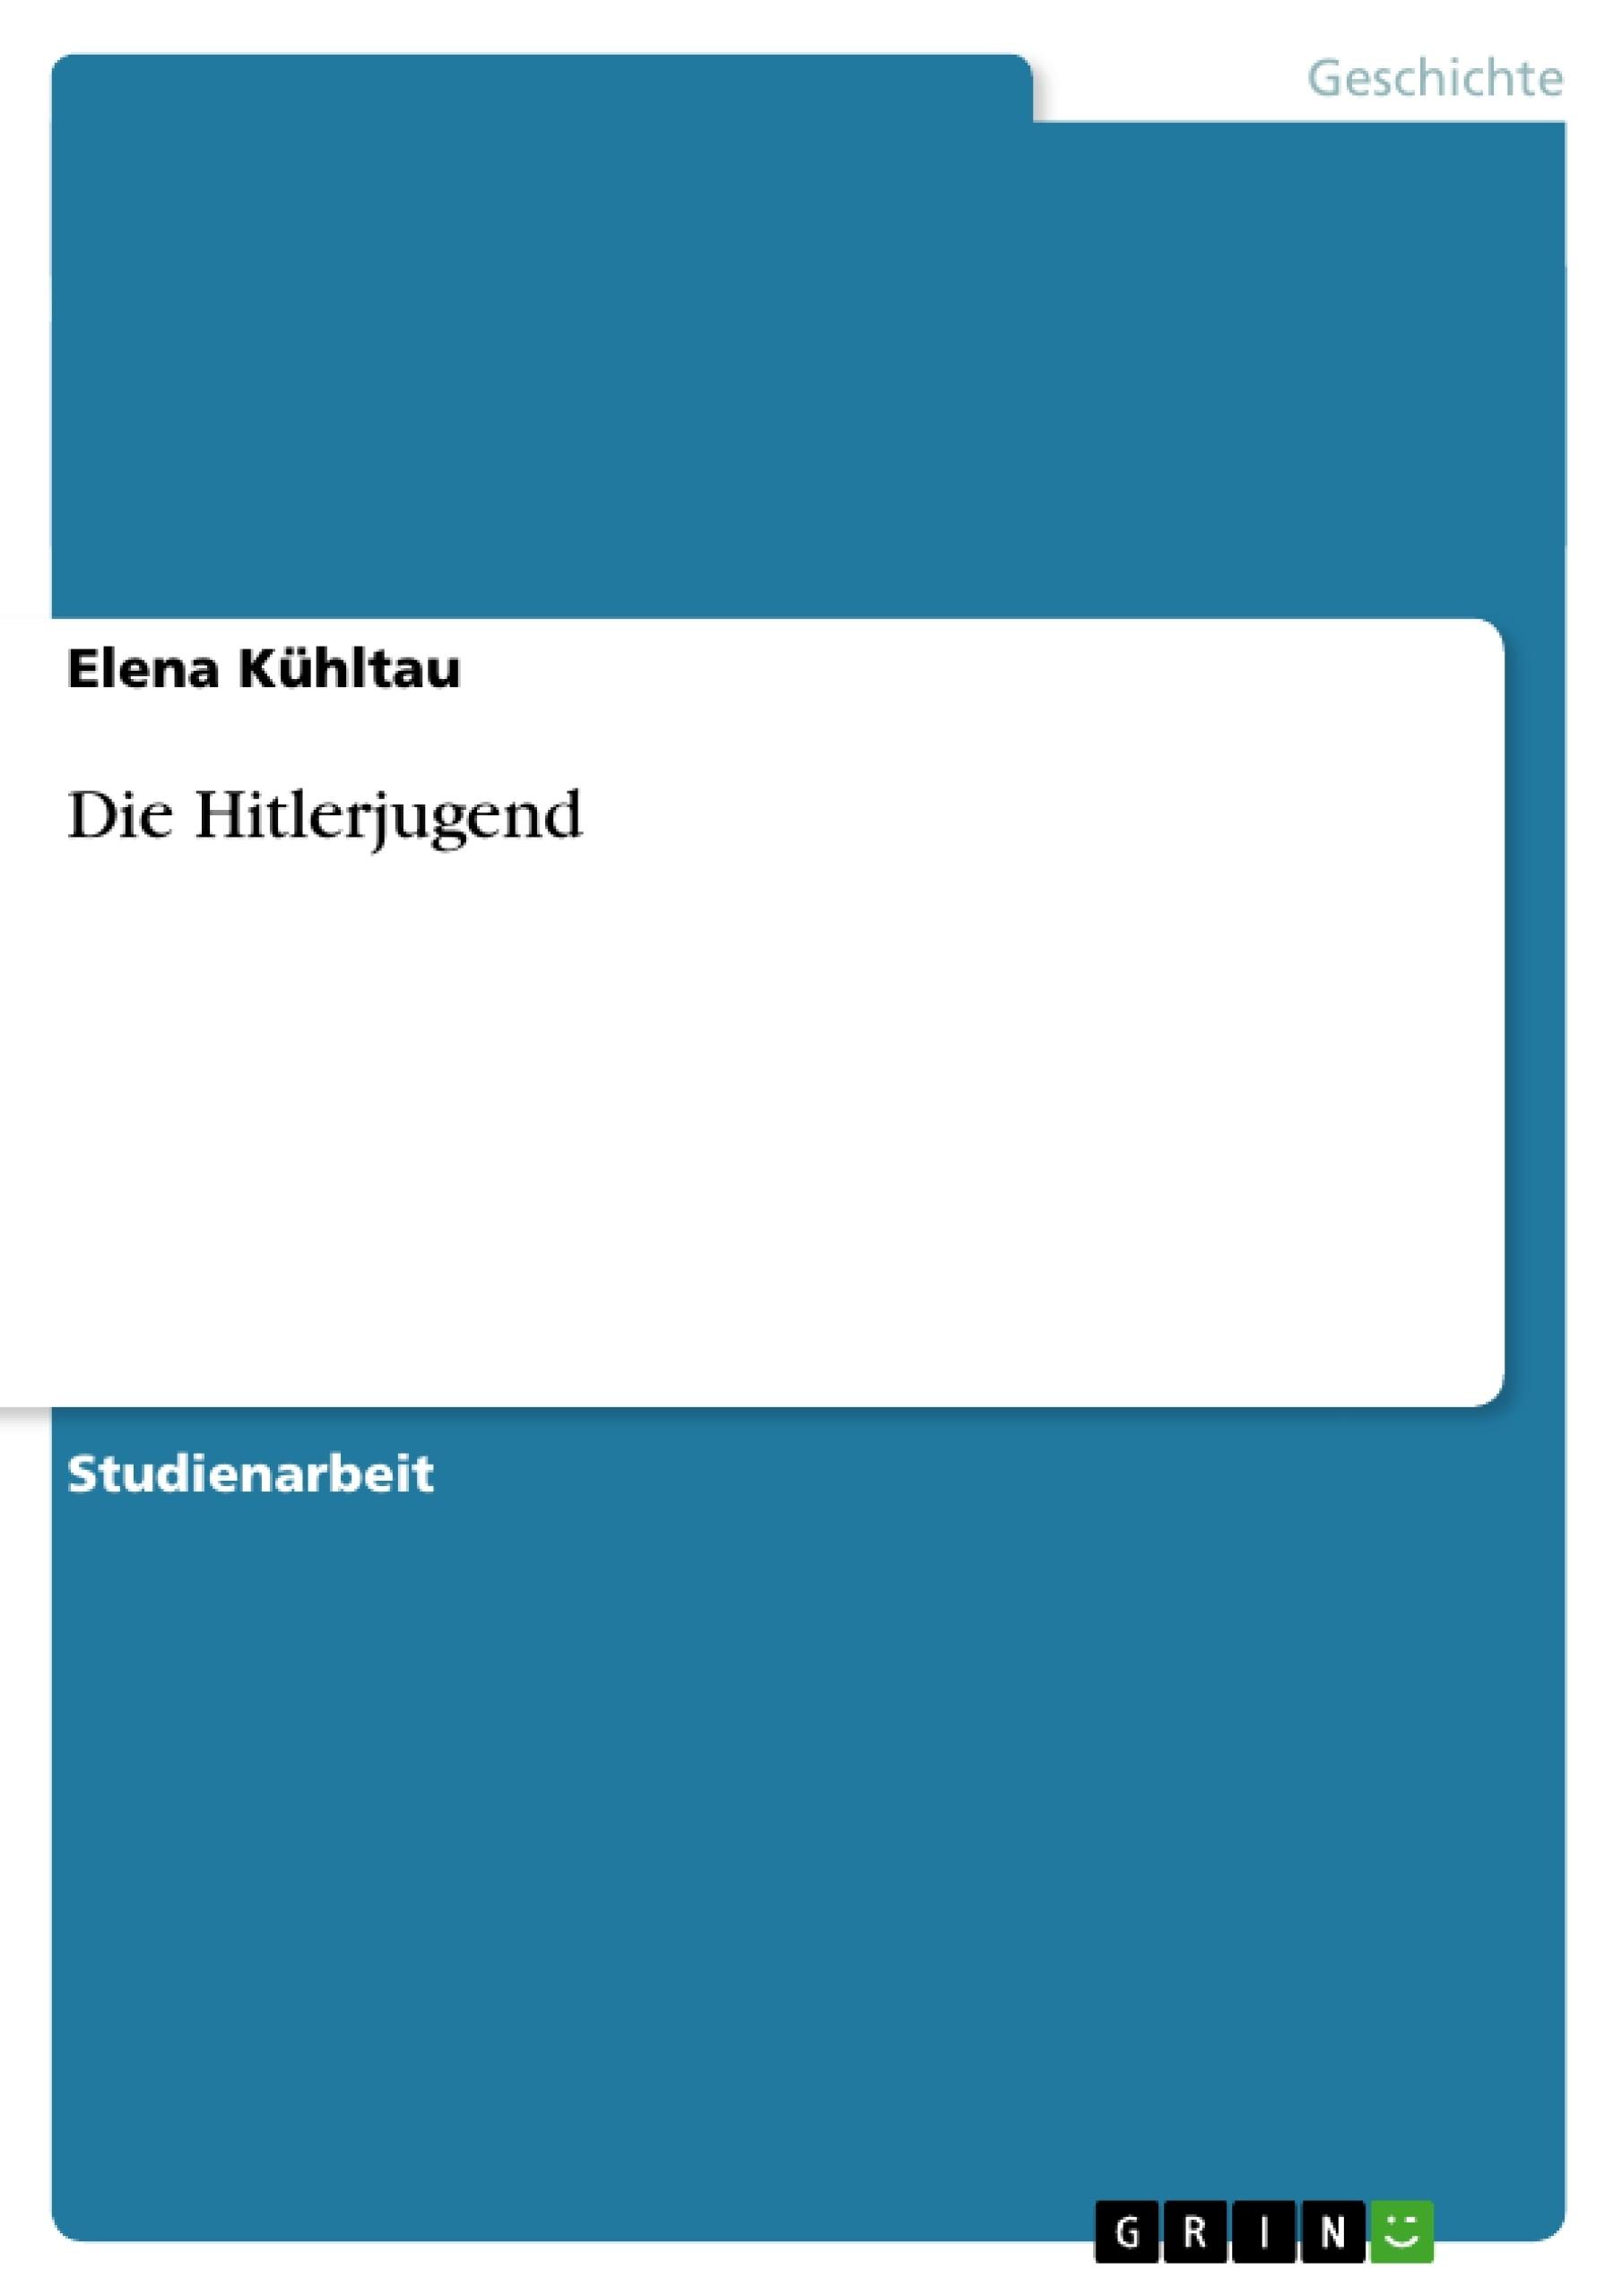 Titel: Die Hitlerjugend